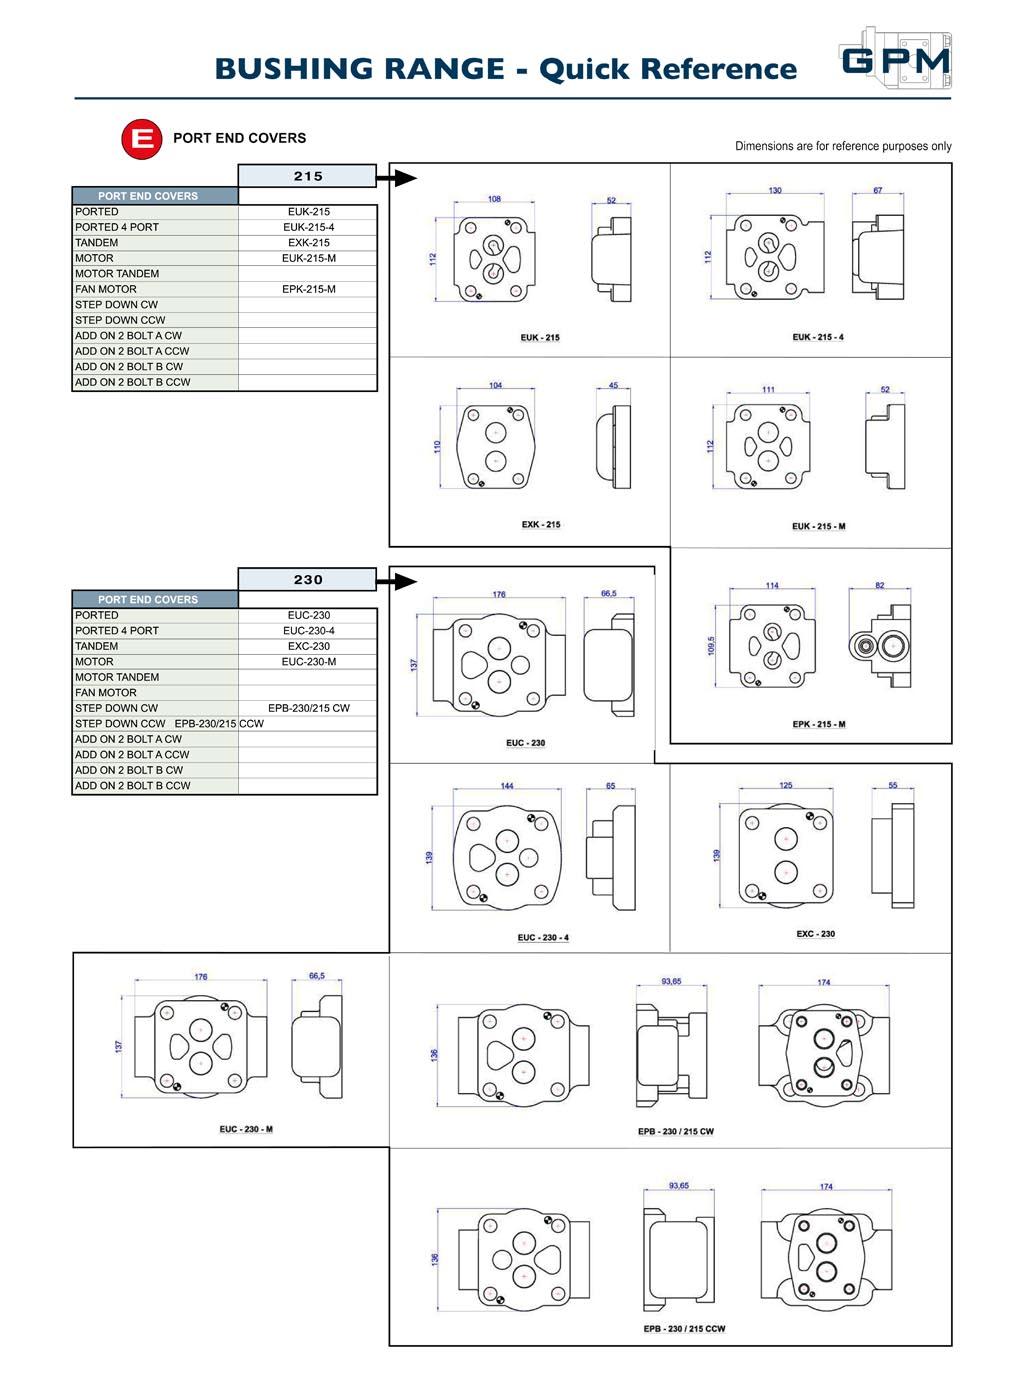 GPM Bushing Pumps Quick Reference E1